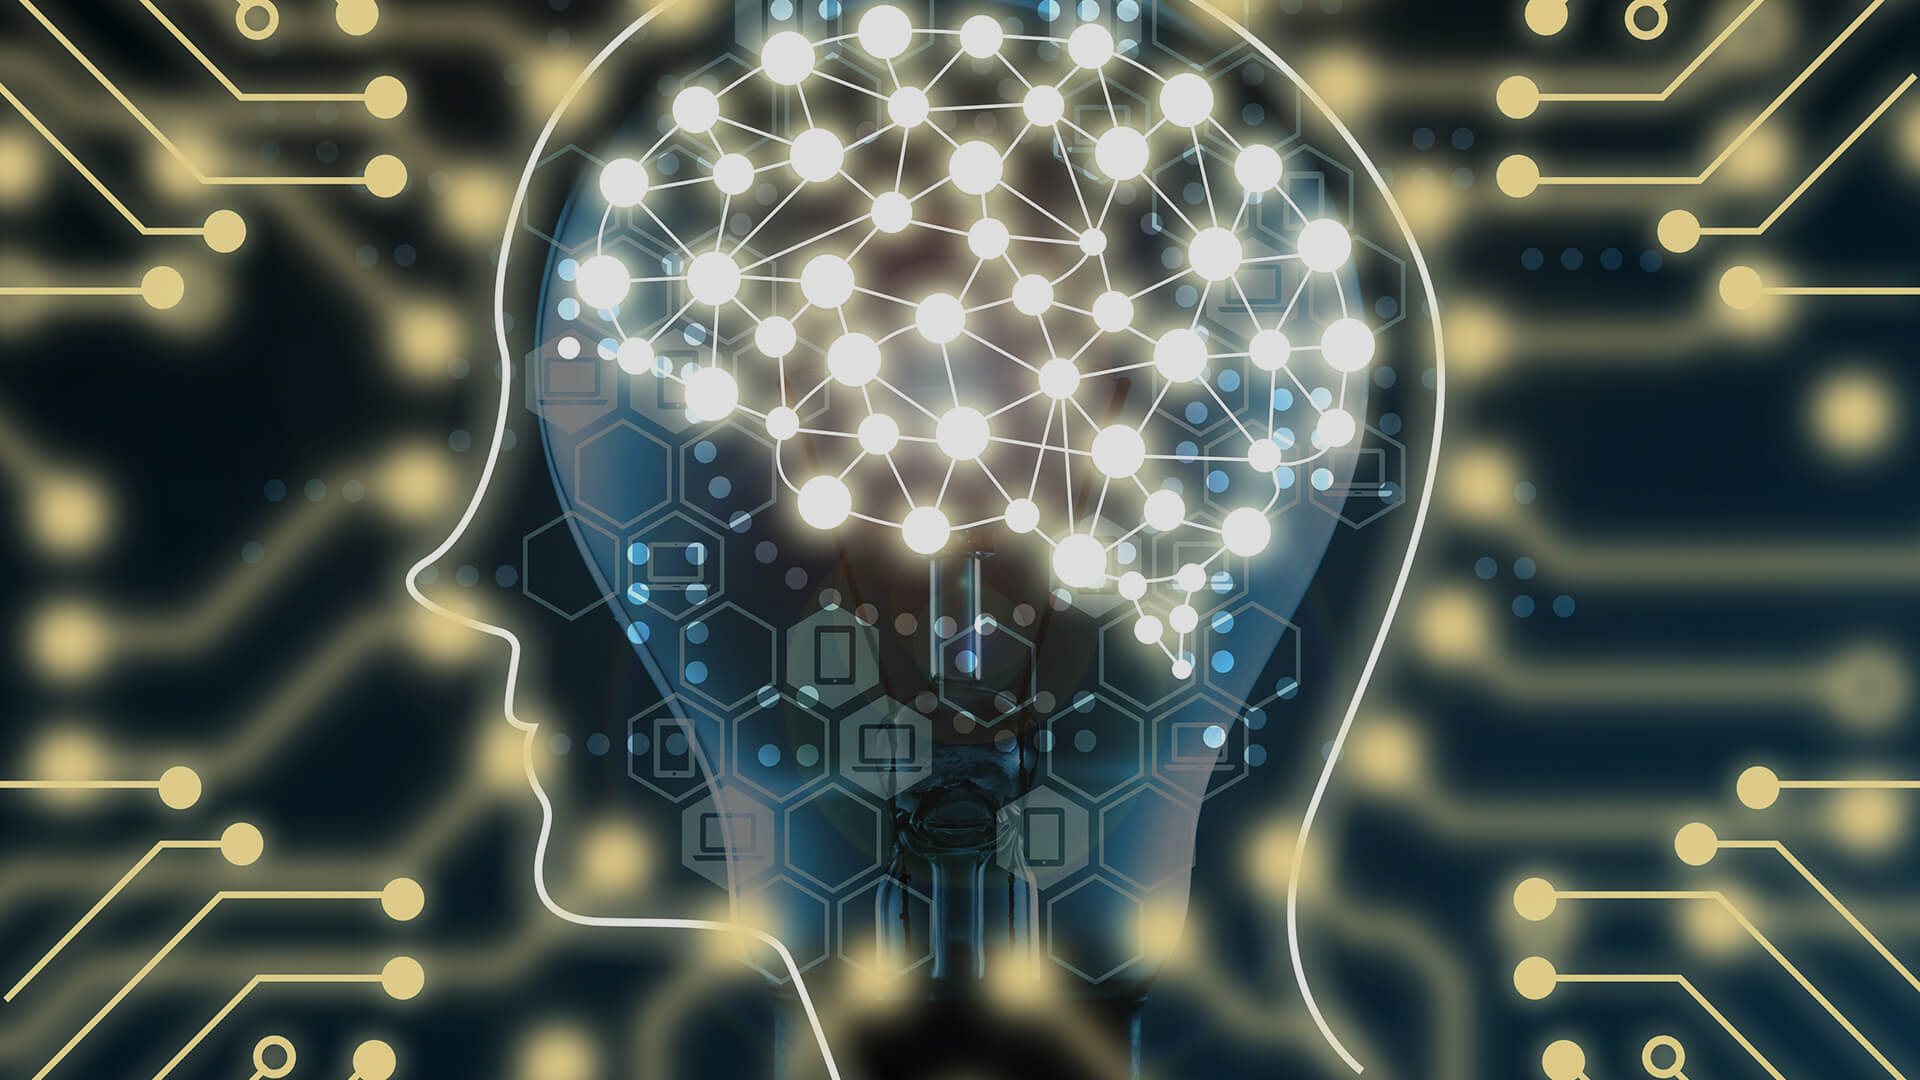 artificial-intelligence-ai-machine-learning-brain-ss-1920